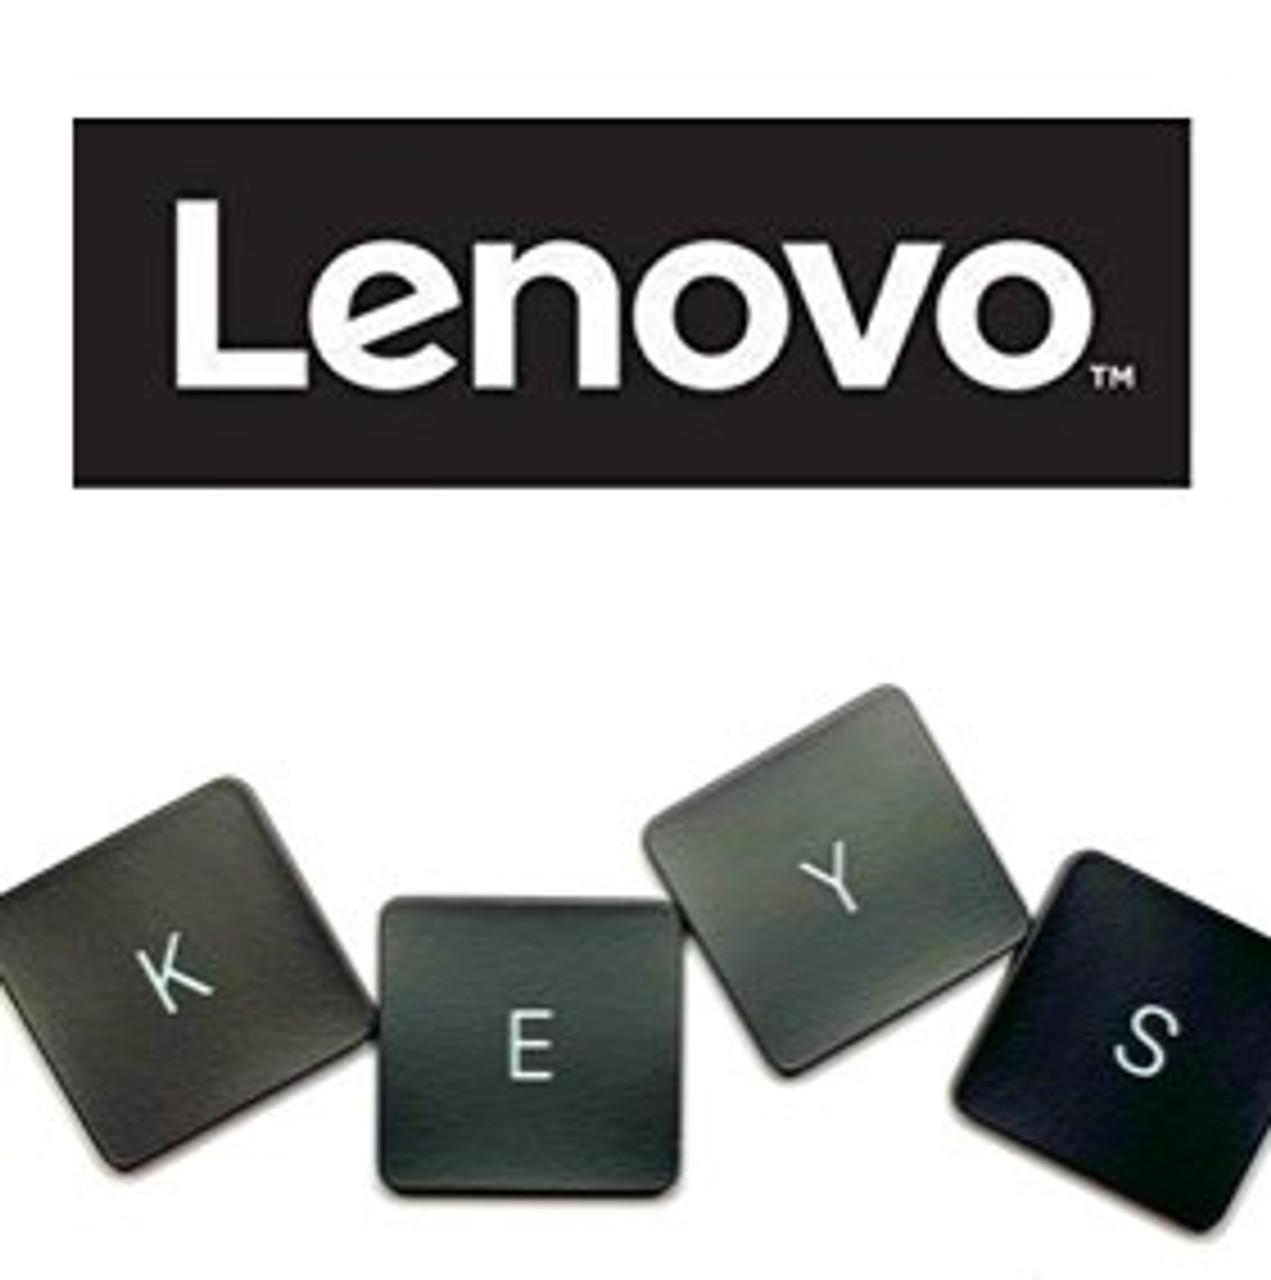 Lenovo X1 Carbon Laptop Keyboard Key Replacement (1st Gen)